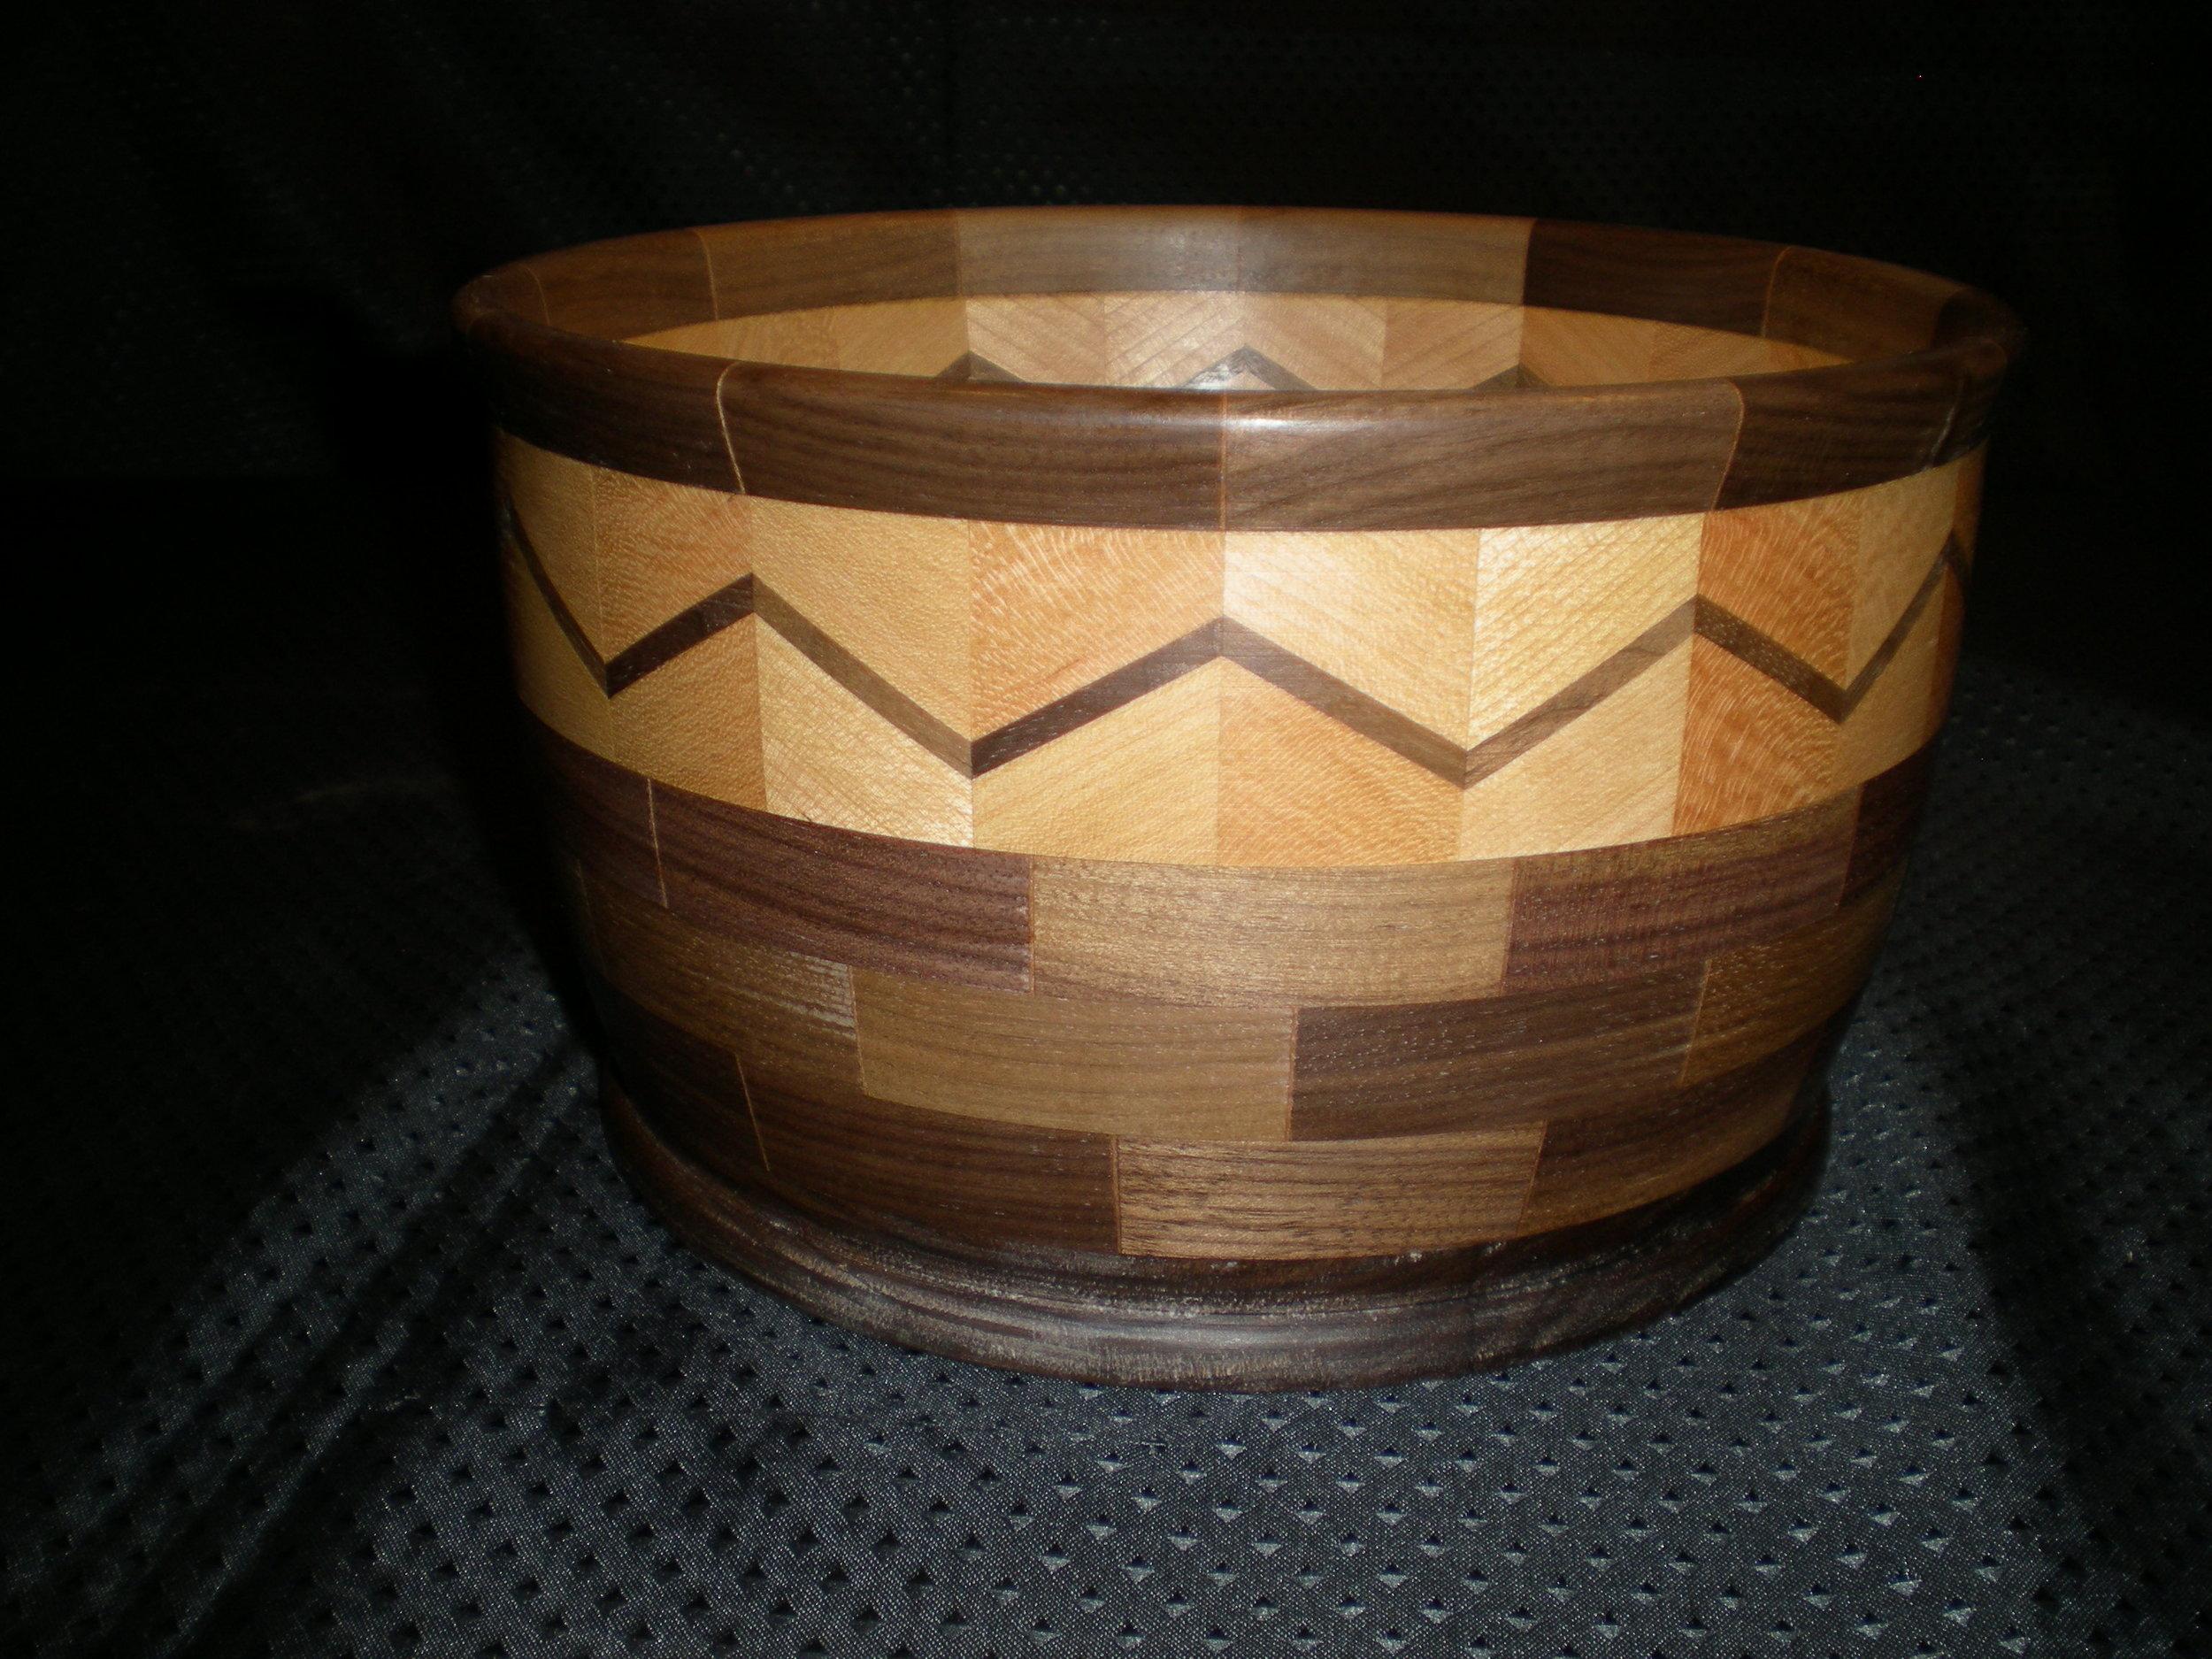 RJC Wood Creations - Bowls (2).JPG